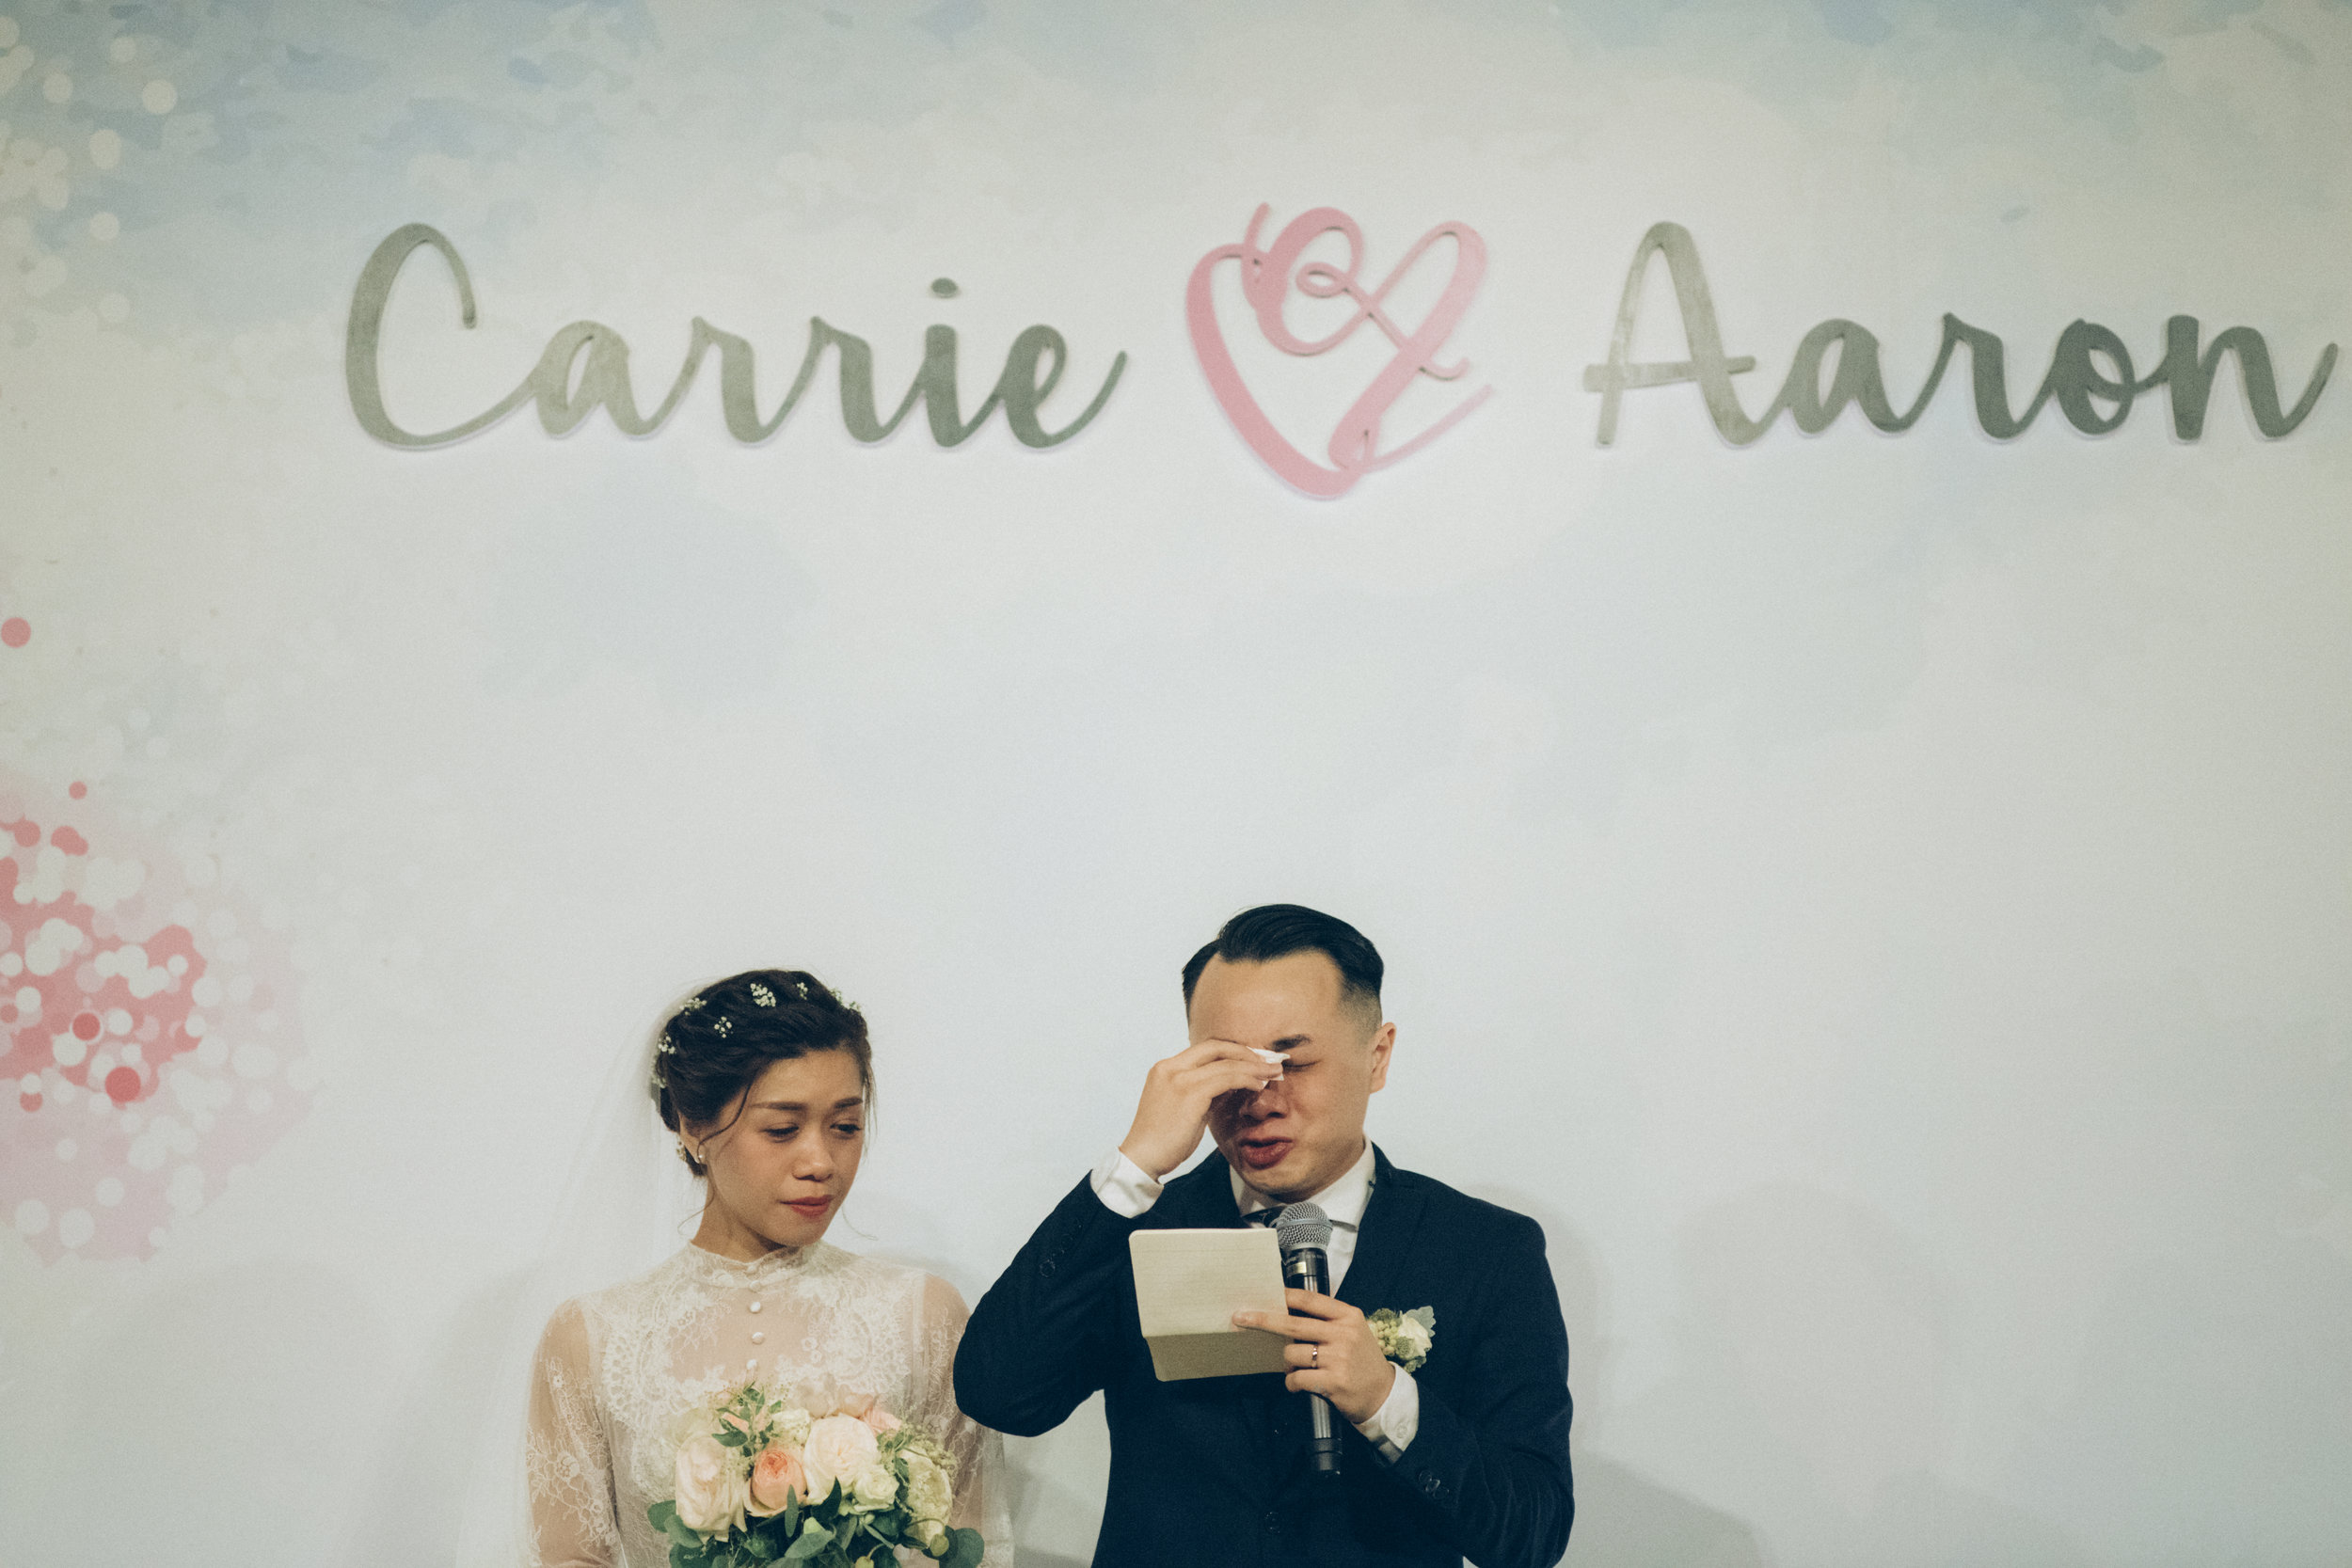 Carrie & Aaron-526.jpg